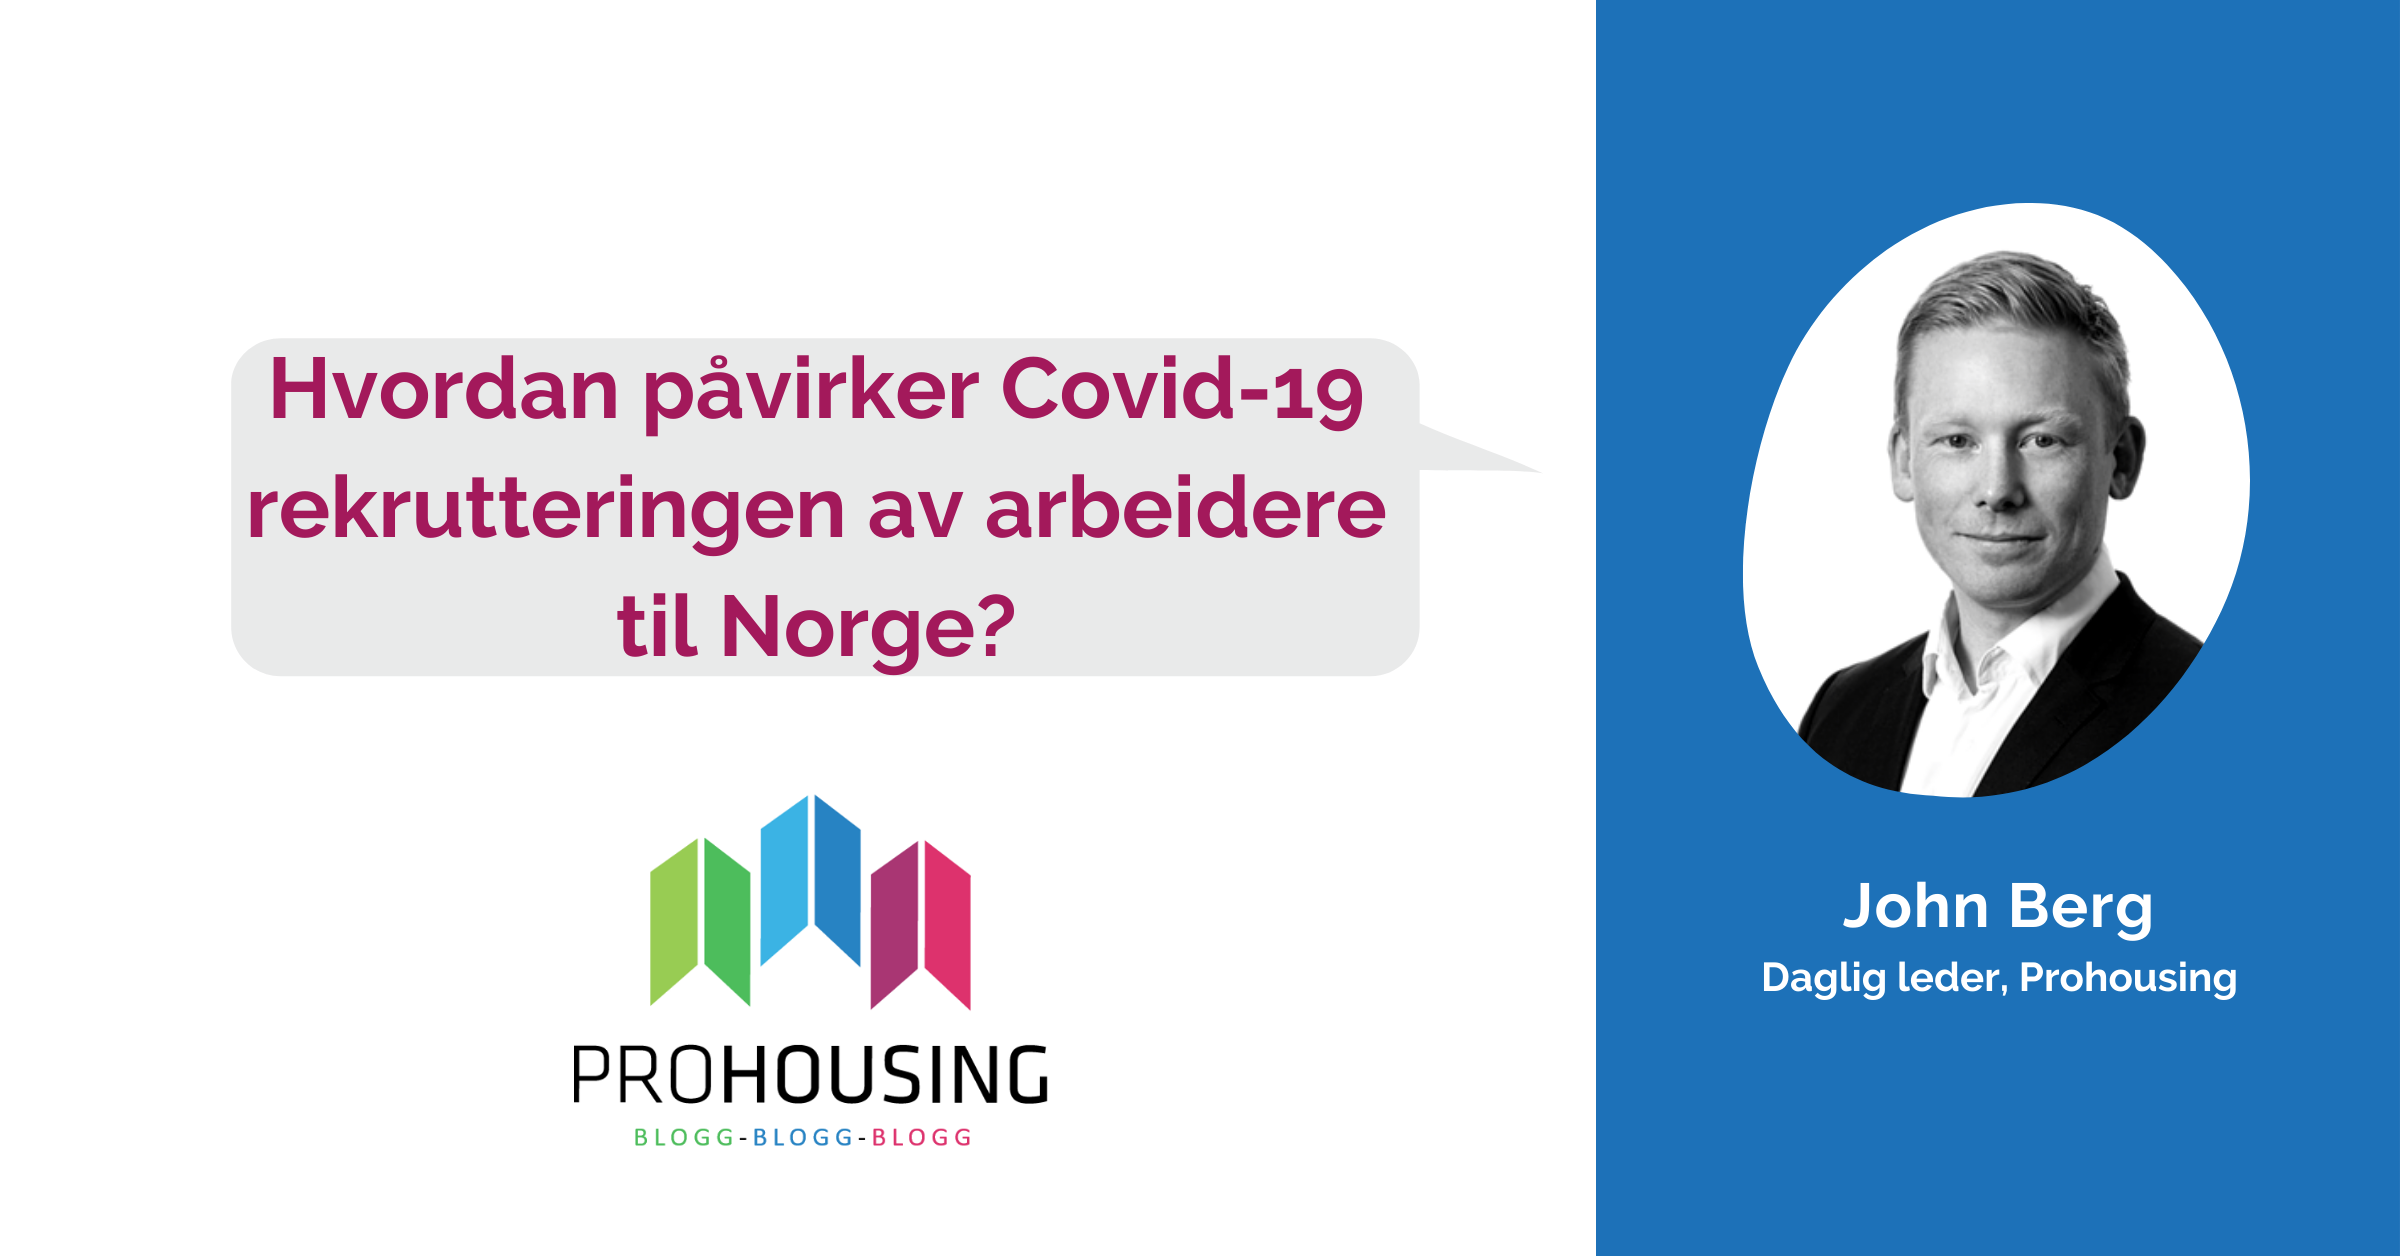 Hvordan påvirker Covid-19 rekruttering til Norge?